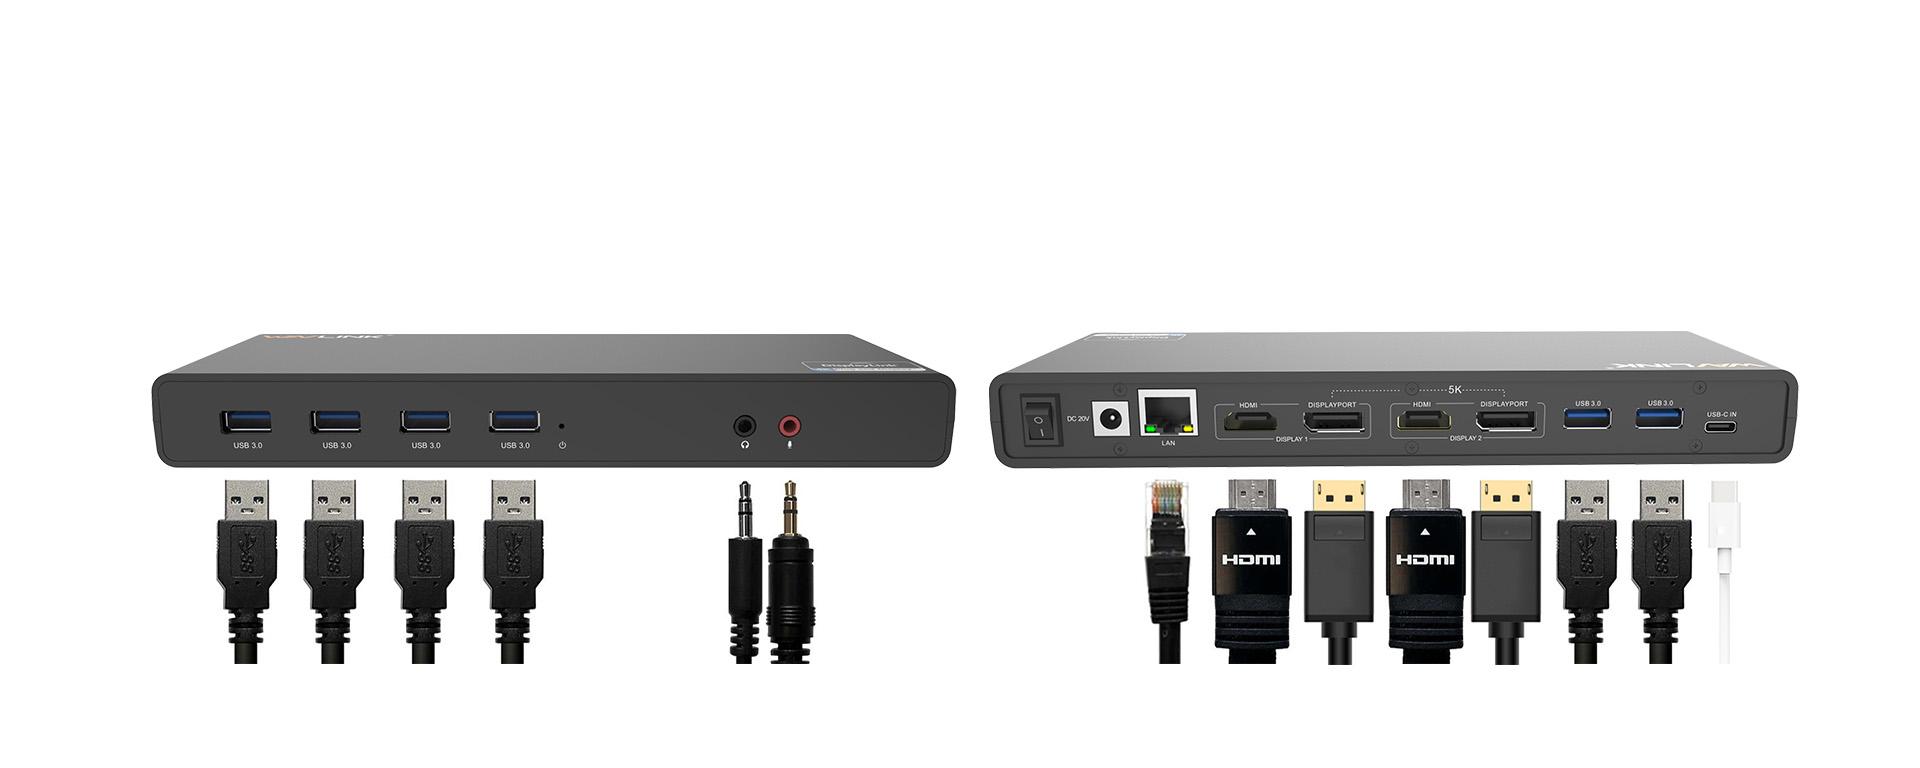 WAVLINK USB UNIVERSAL DOCKING STATION USB-C IN DUAL 4K UG69DK1 5 7